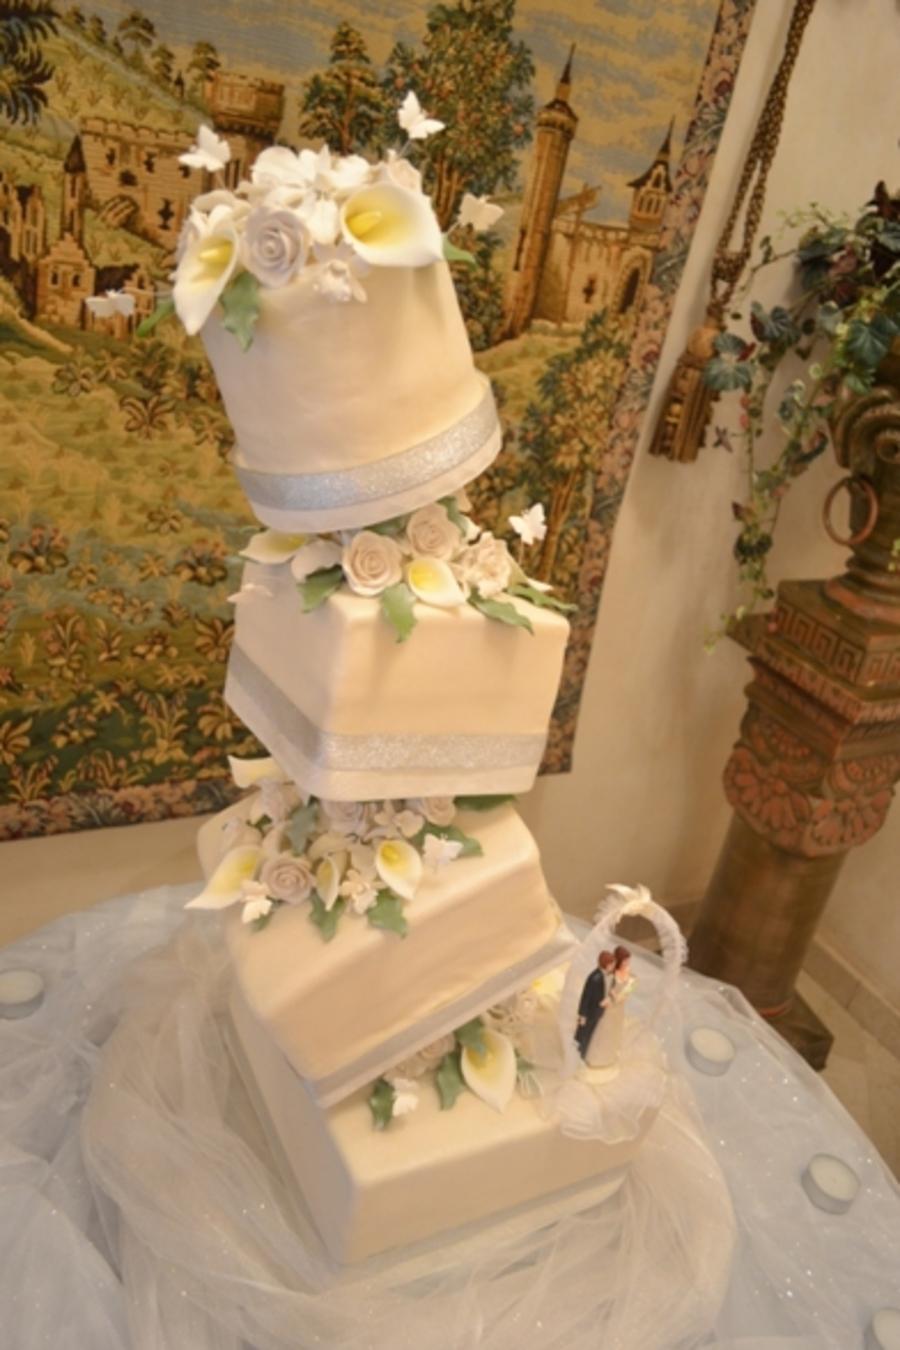 Topsy Turvy Caddy Wampus Wedding Cake - CakeCentral.com